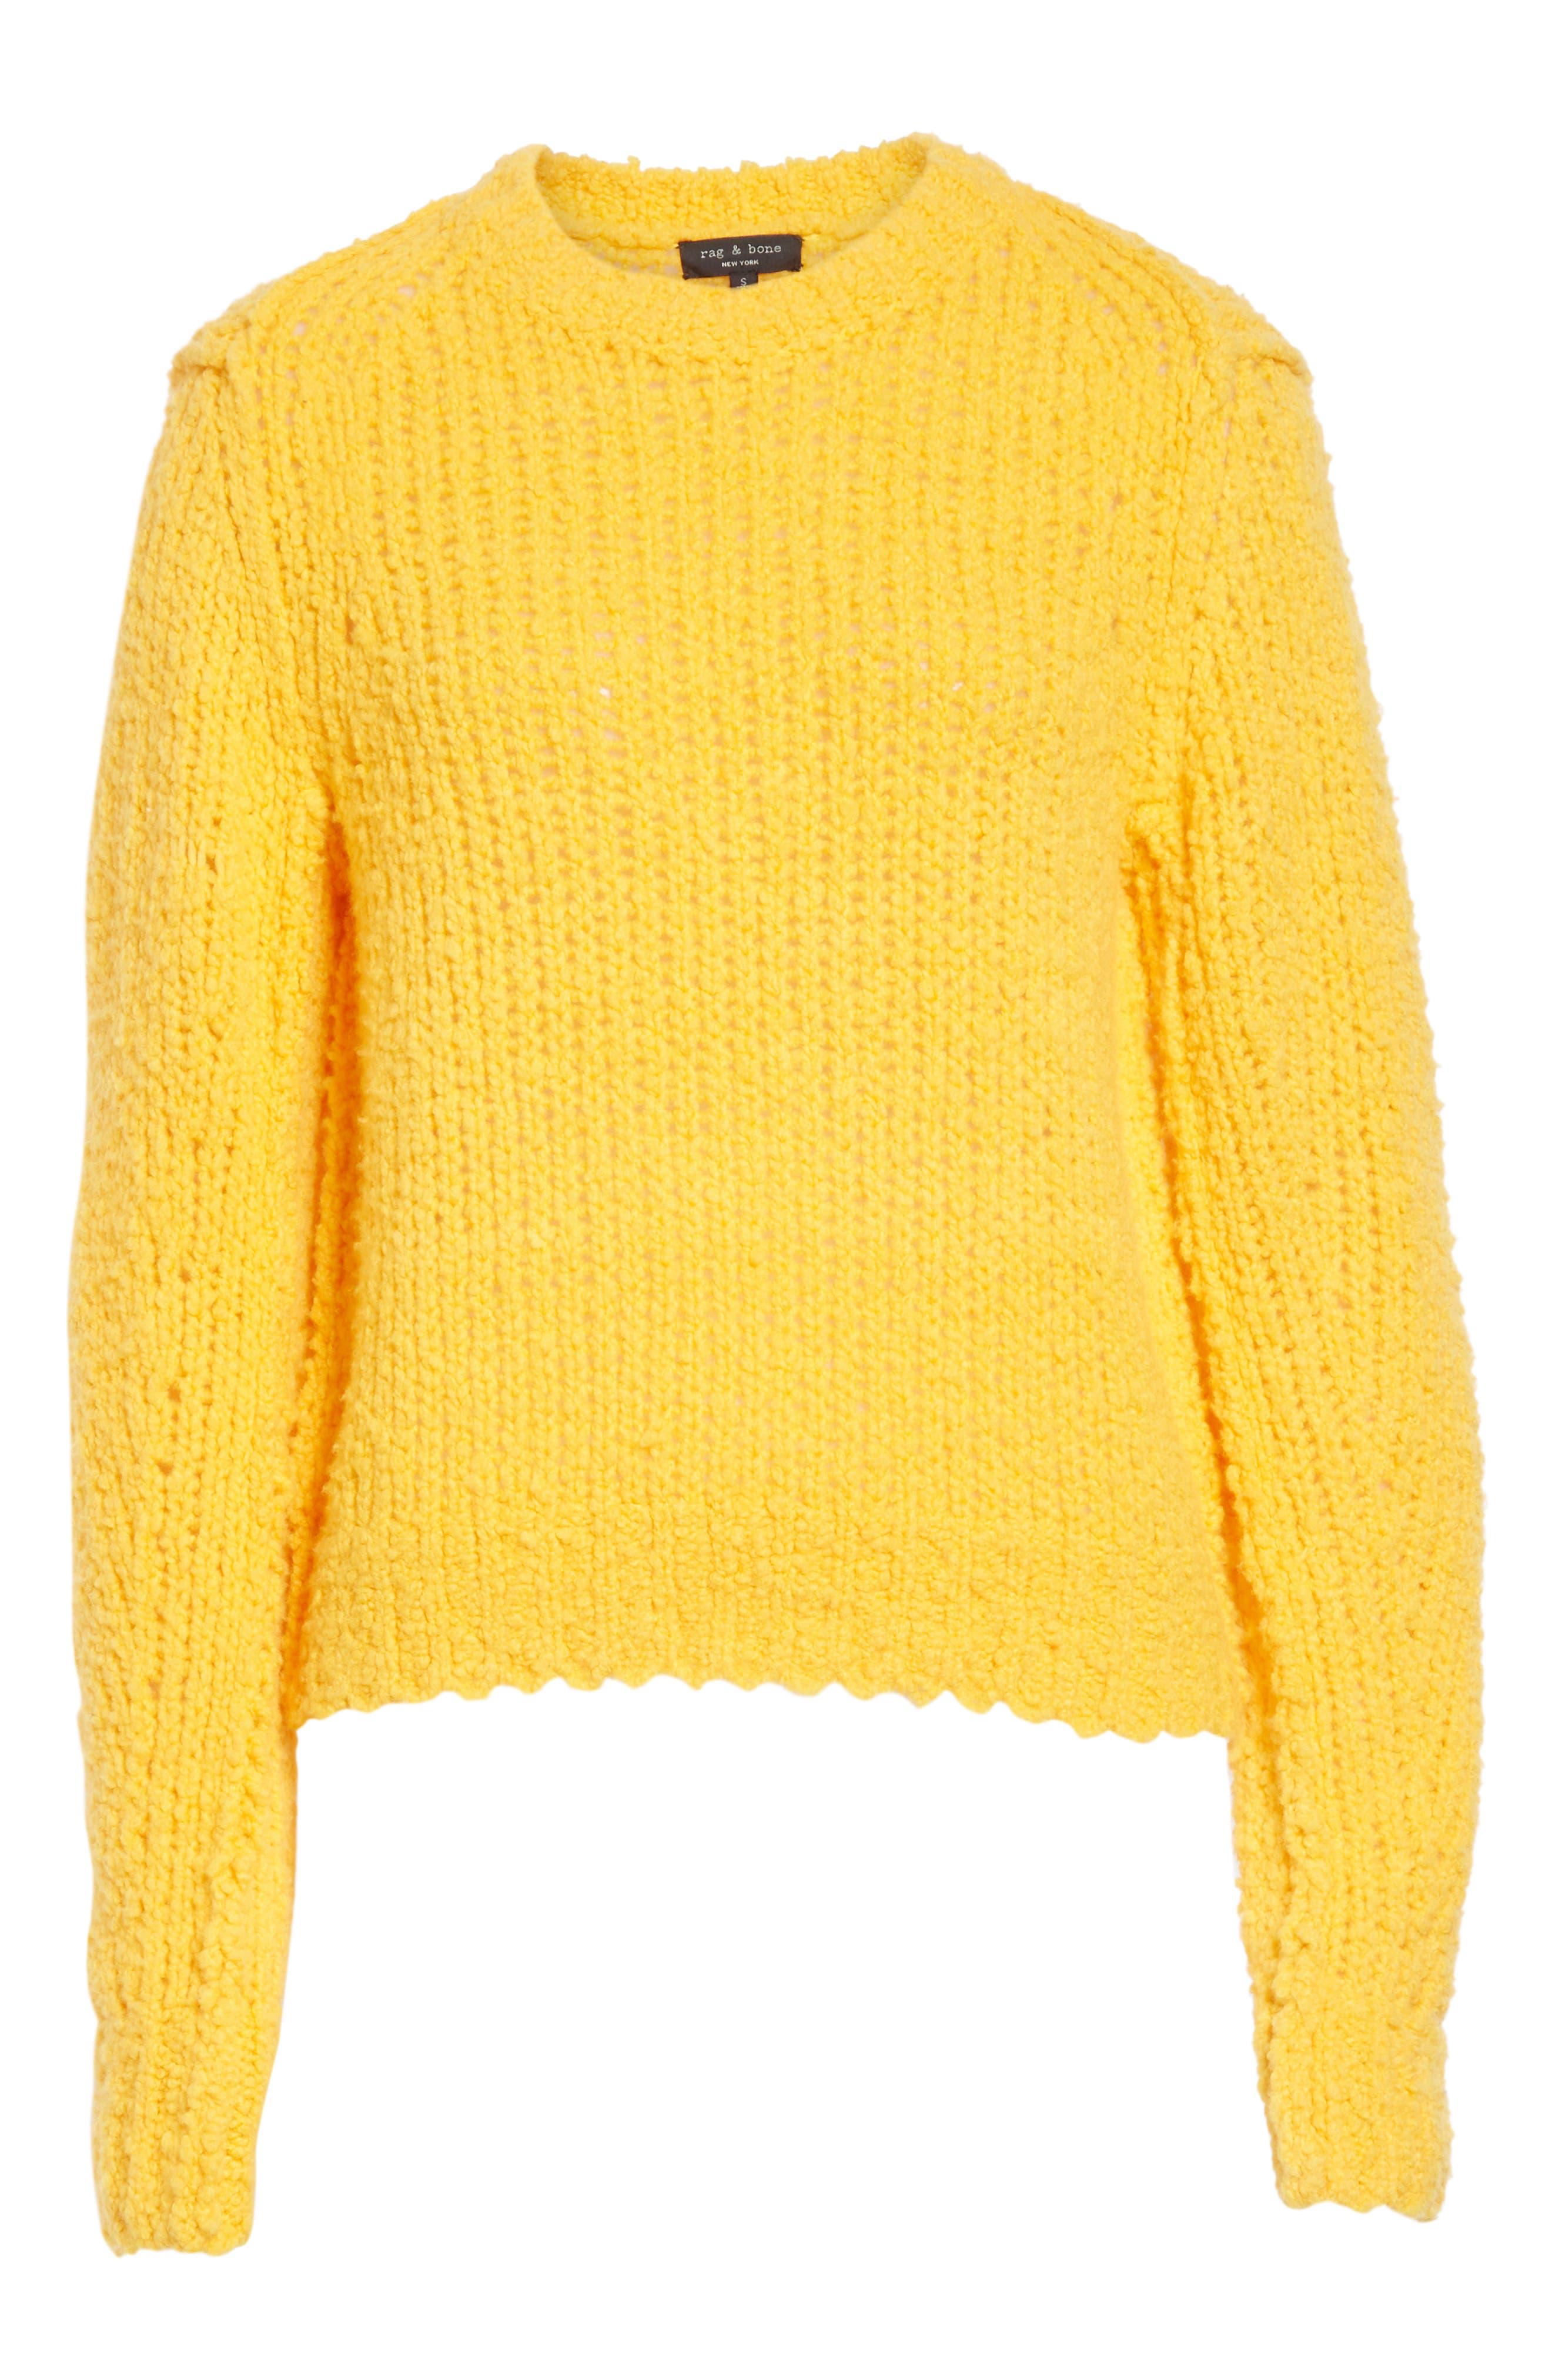 Arizona Merino Wool Sweater,                             Alternate thumbnail 6, color,                             GOLD